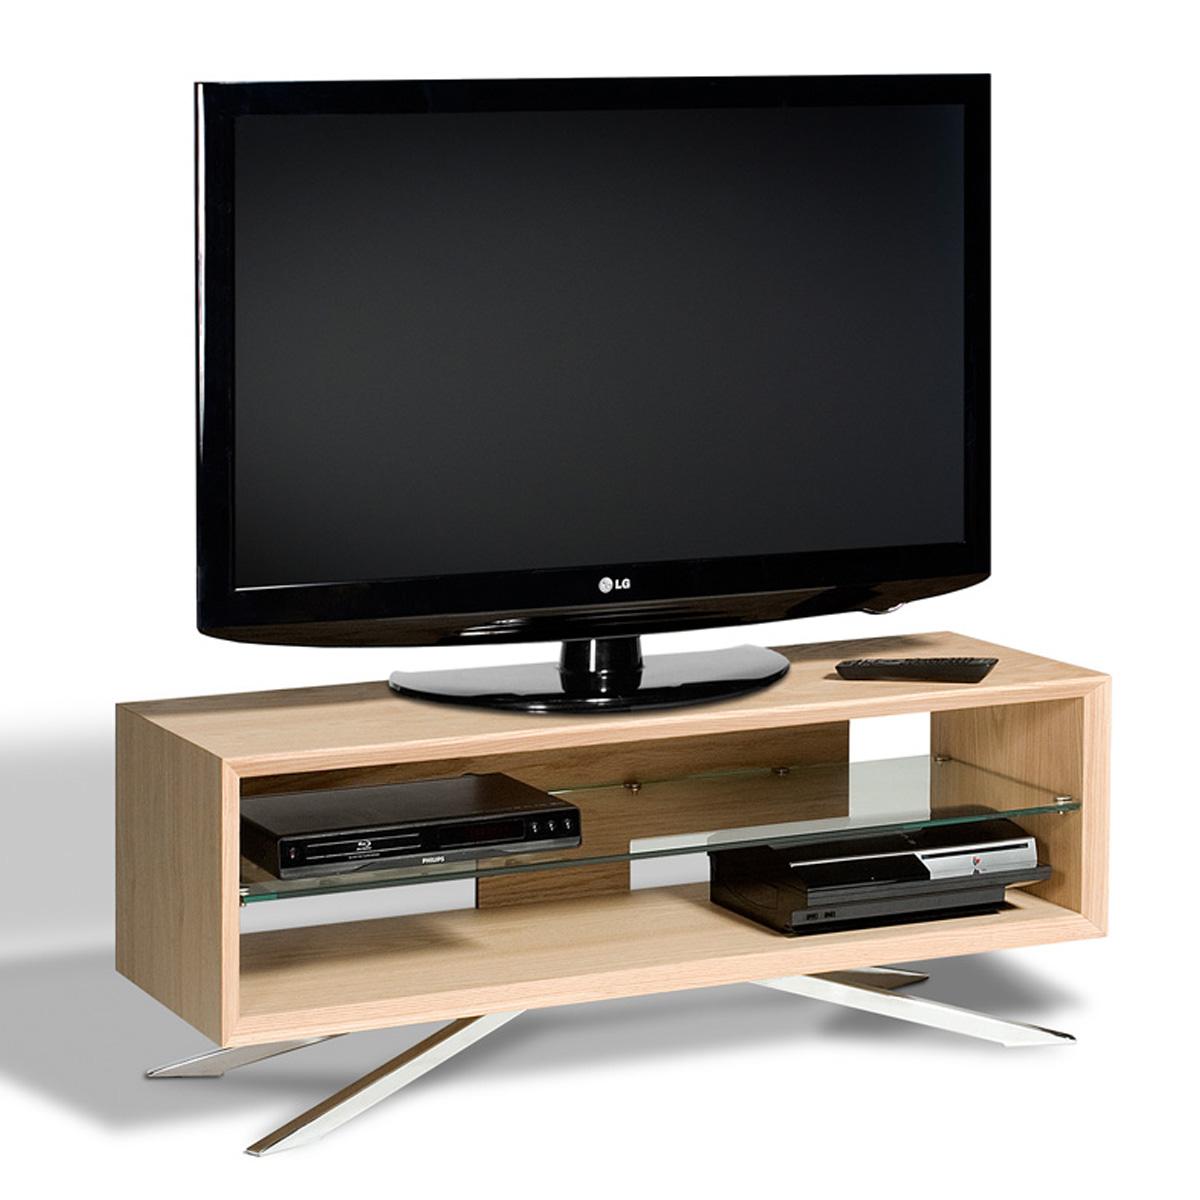 light oak low level clear glass shelf lcd plasma tv stand 42 inch screens. Black Bedroom Furniture Sets. Home Design Ideas